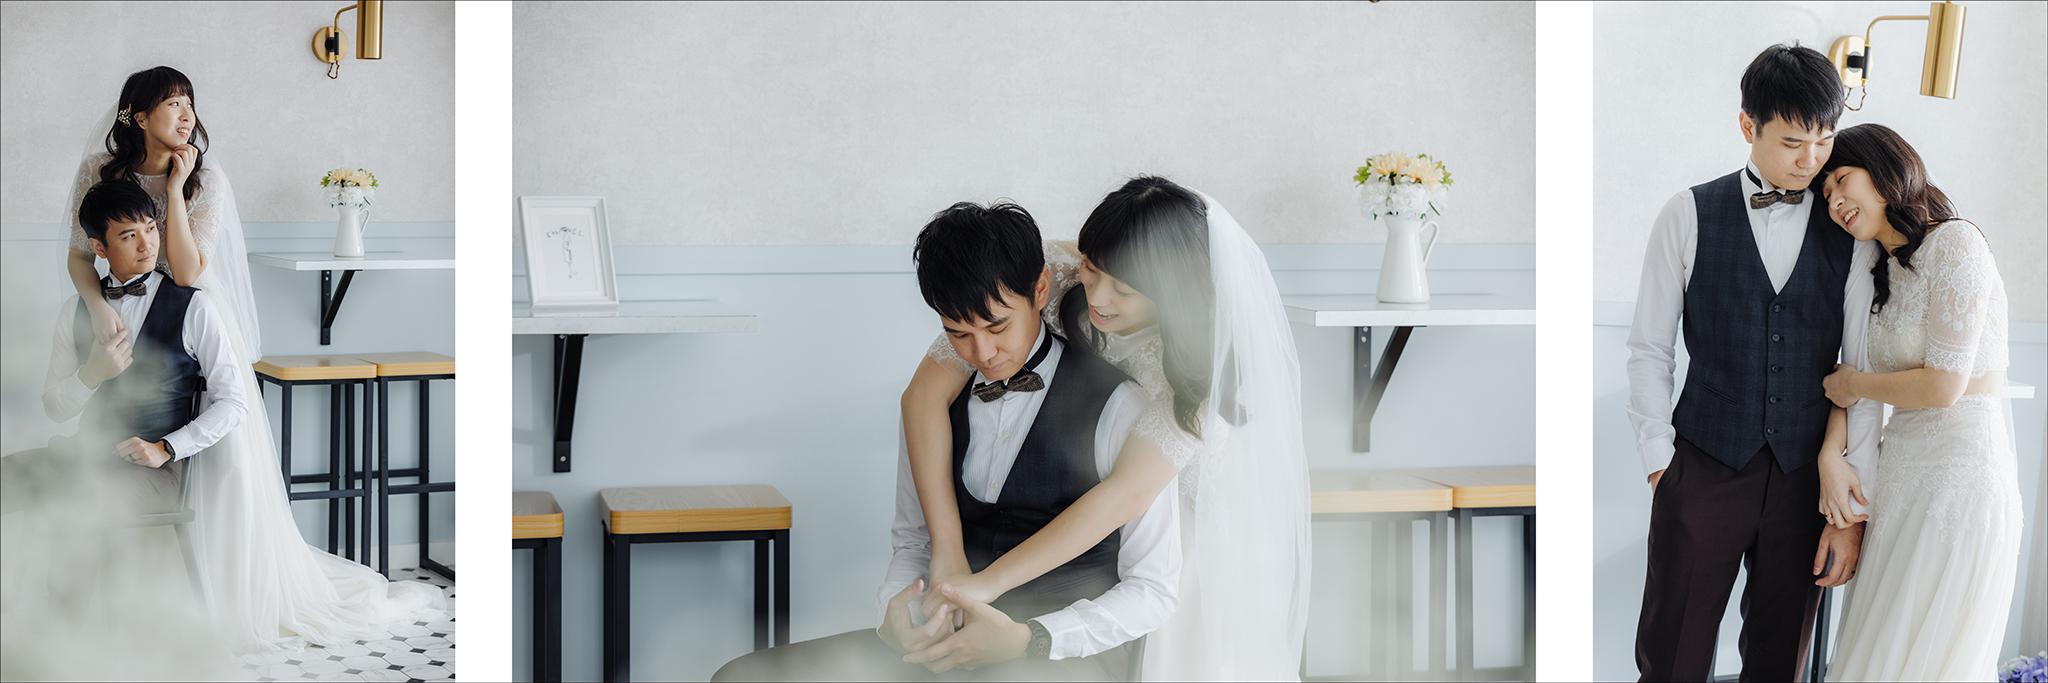 49822087238 f89fc69ff8 o - 【自助婚紗】+復羽&千倫+